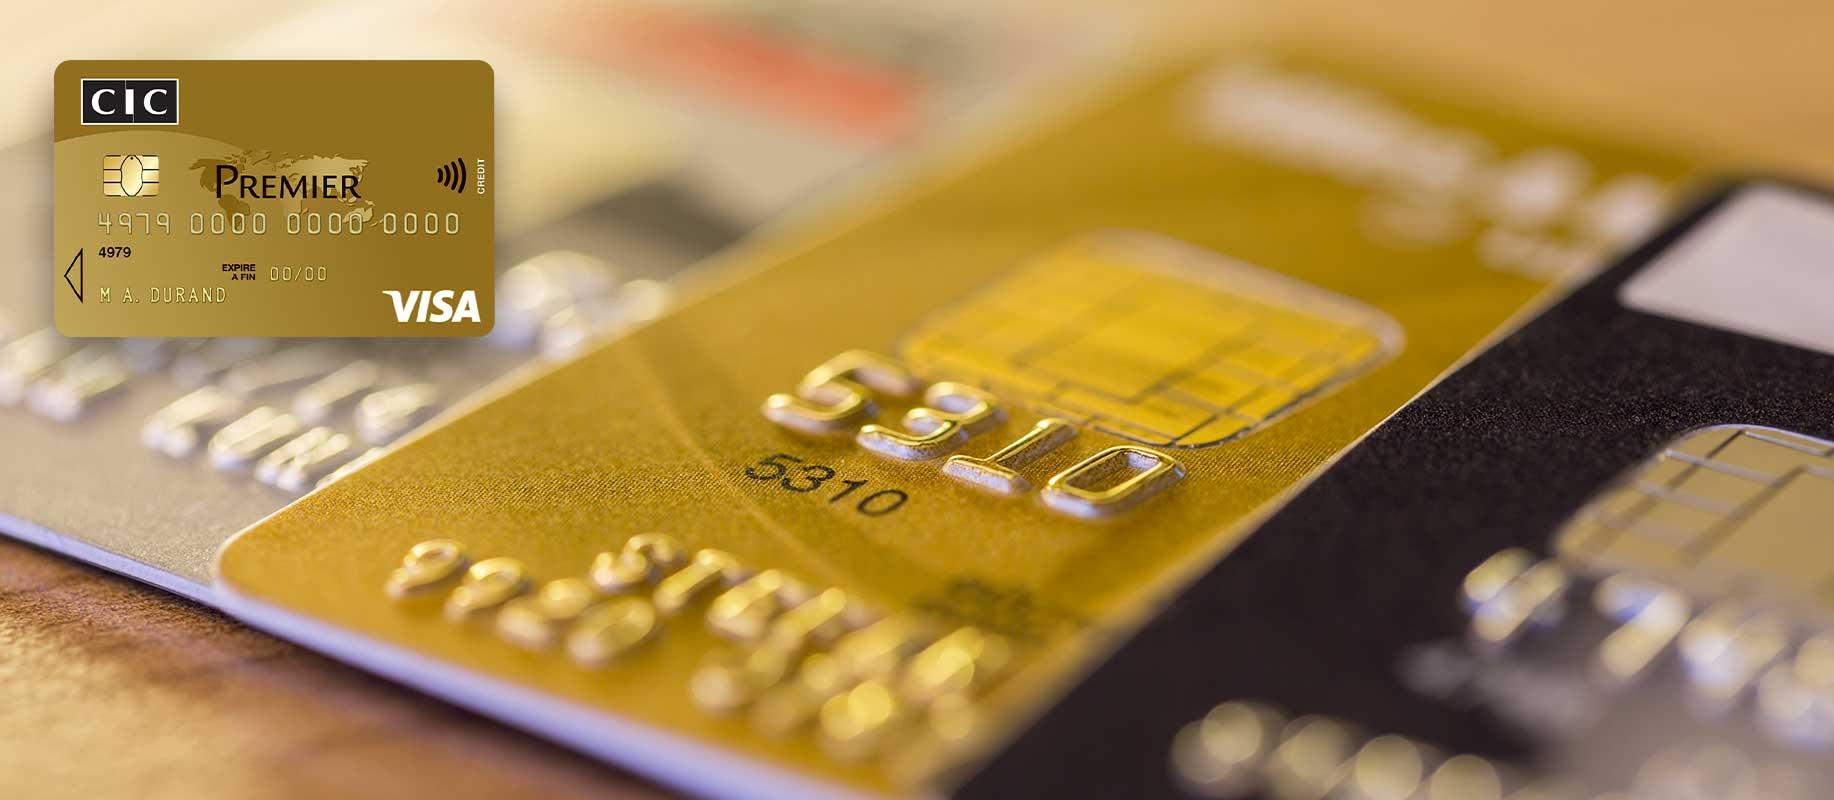 assurance voyage carte visa premier Carte Visa Premier | CIC